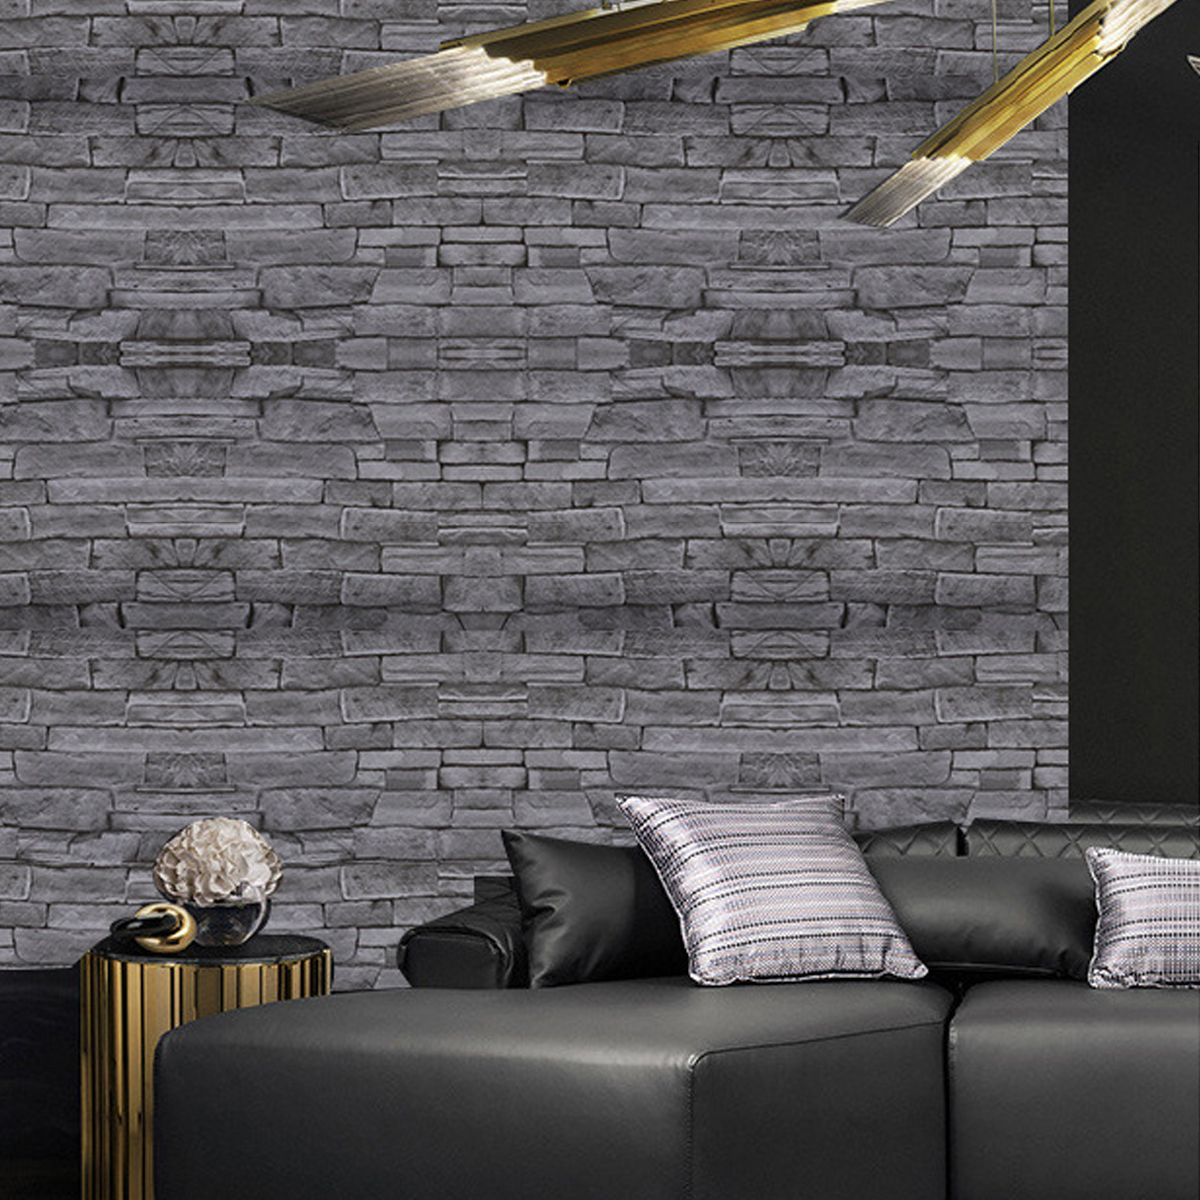 33×1.5ft Brick Peel and Stick Wallpaper PVC Wallpaper ...